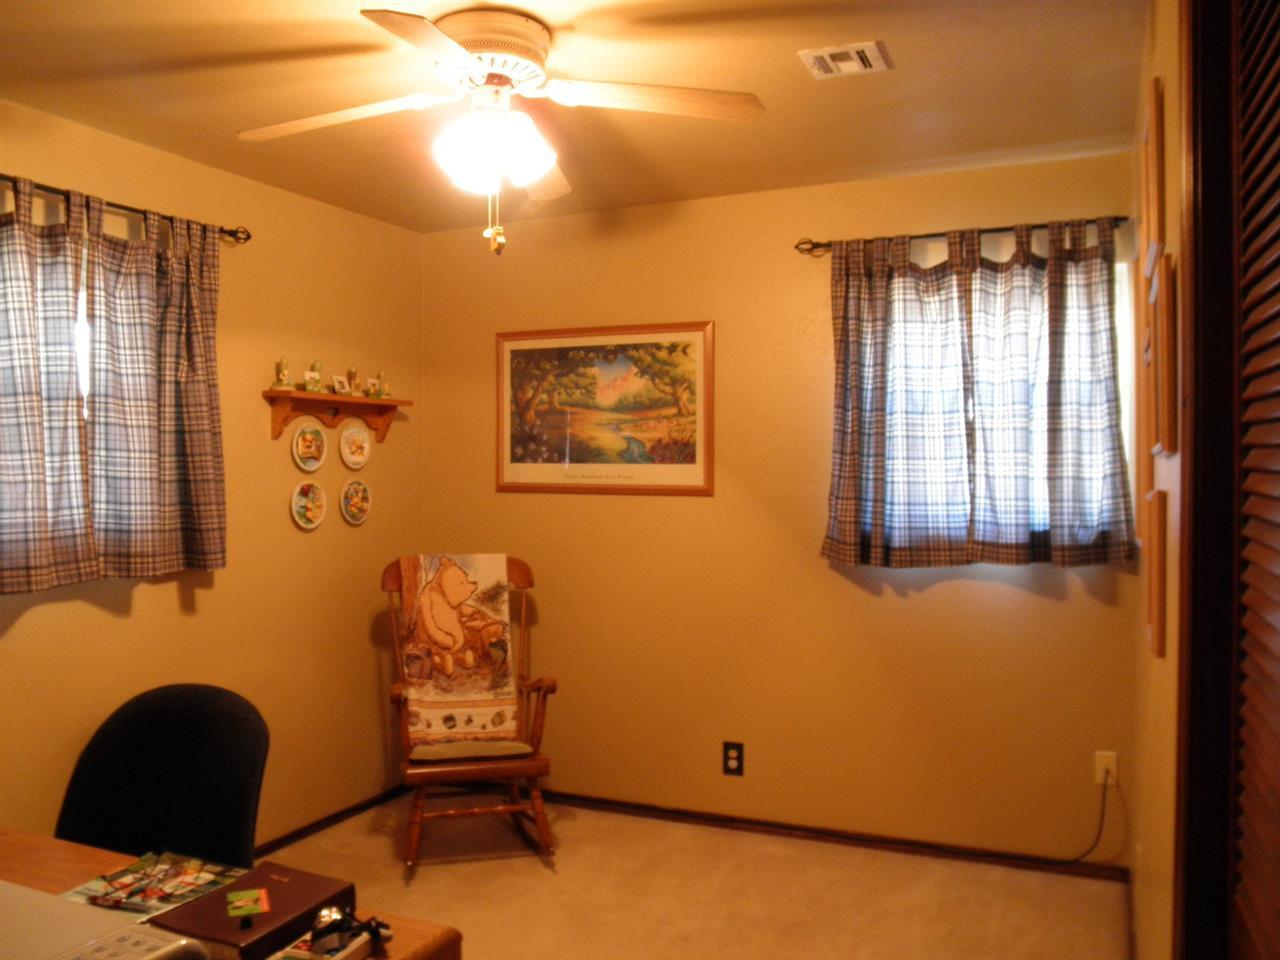 Sold Intraoffice W/MLS | 7038 River Ridge Drive  Ponca City, OK 74604 13